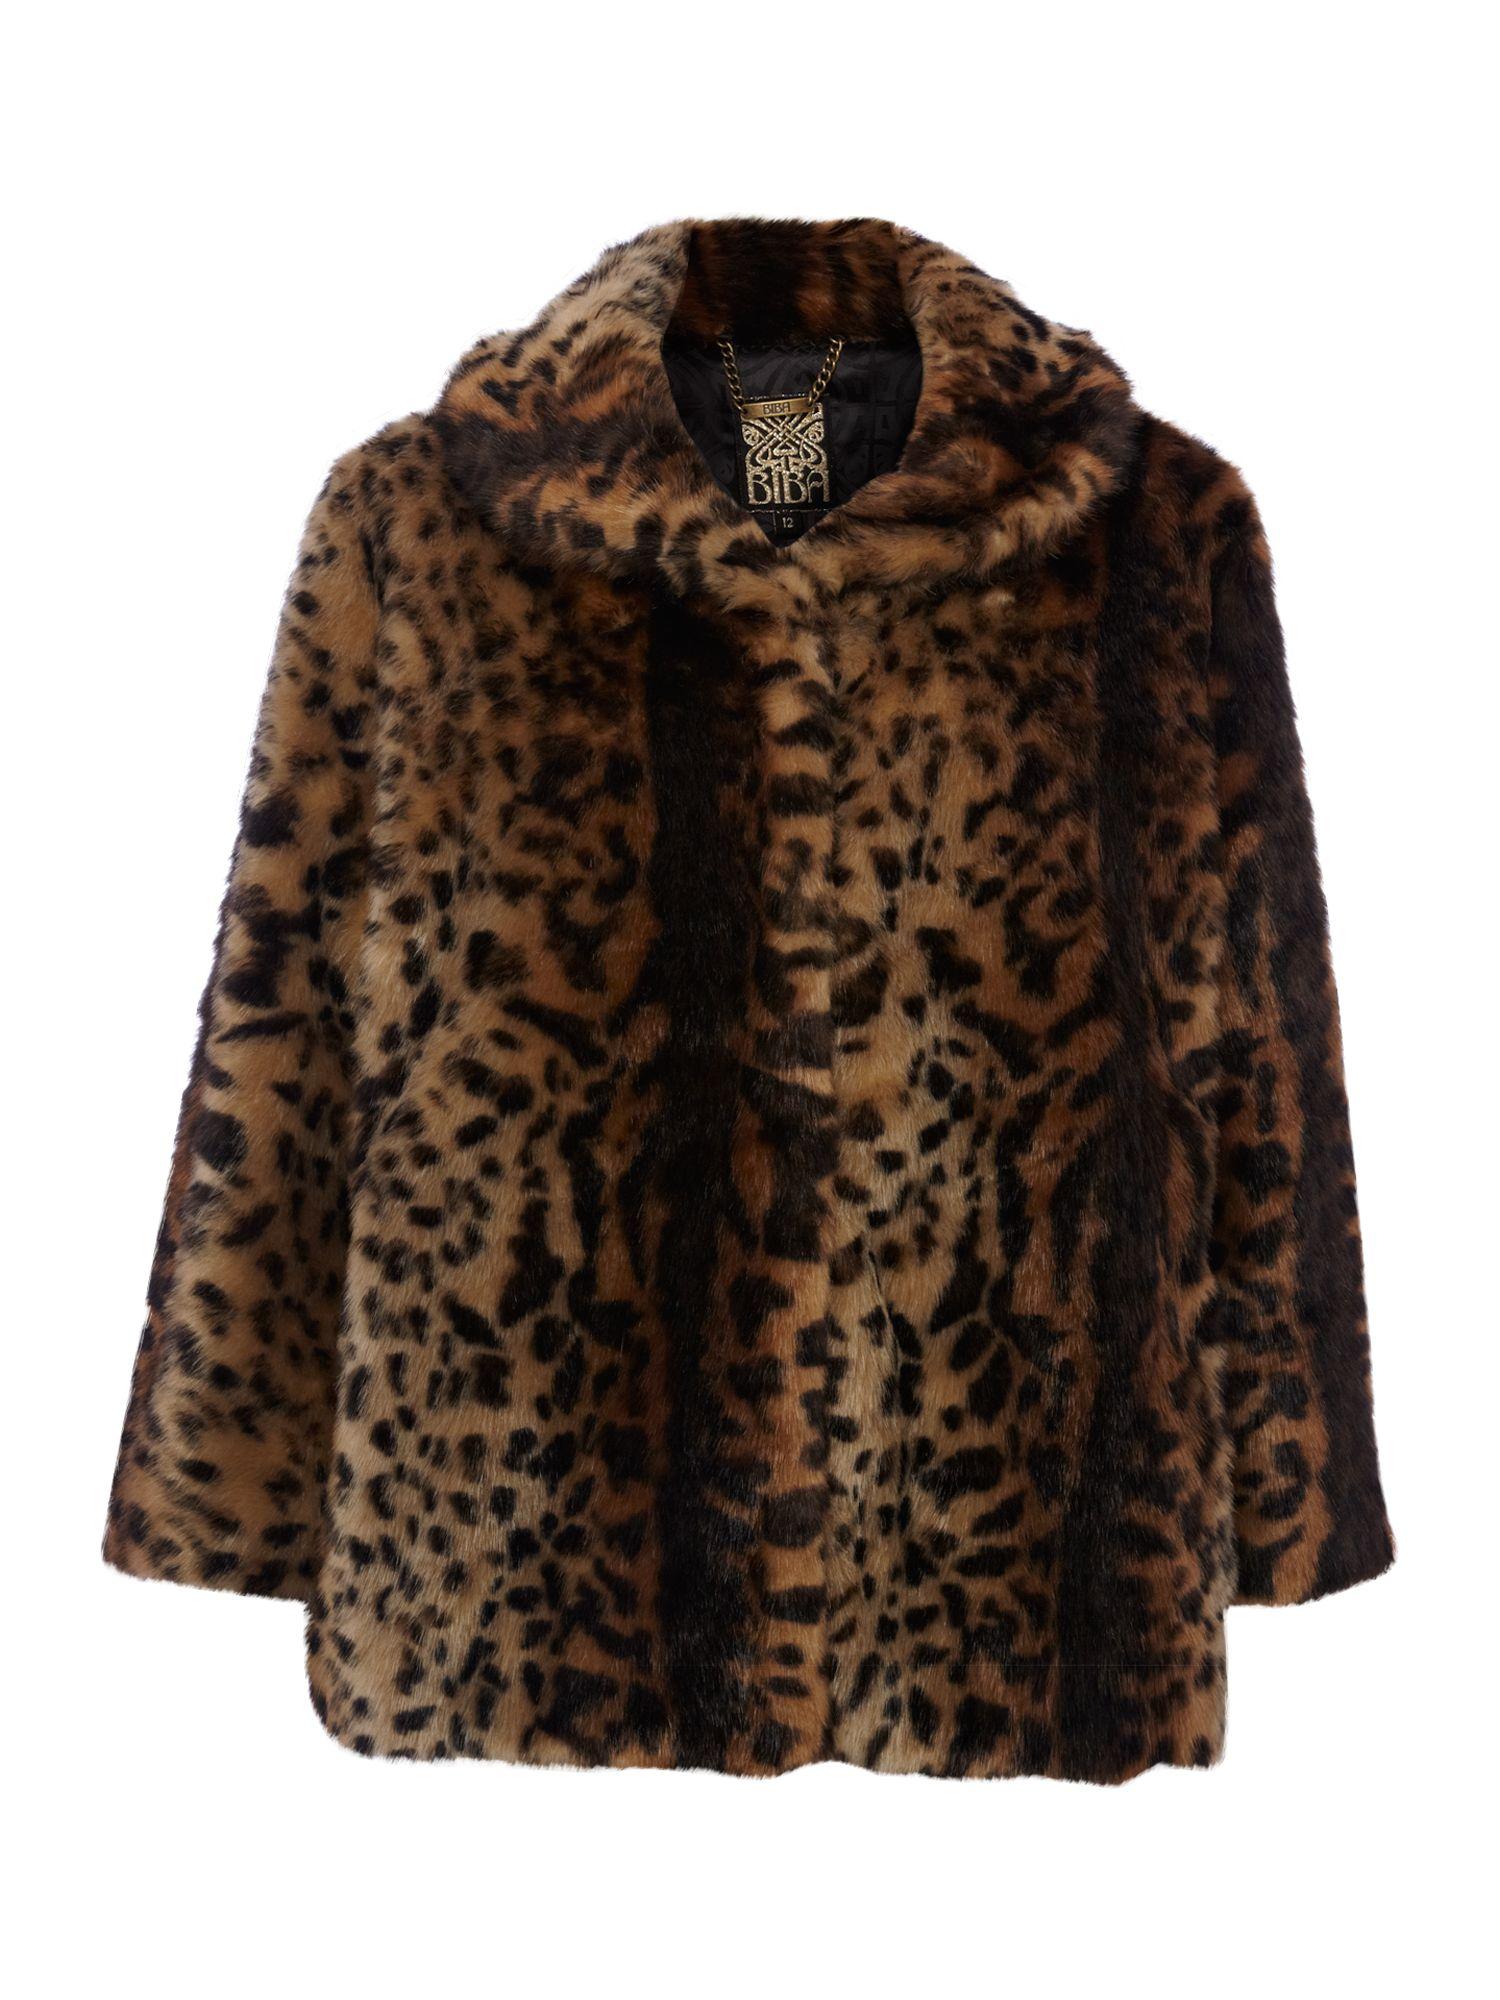 Gray Wolf Faux Fur Coat - YouTube